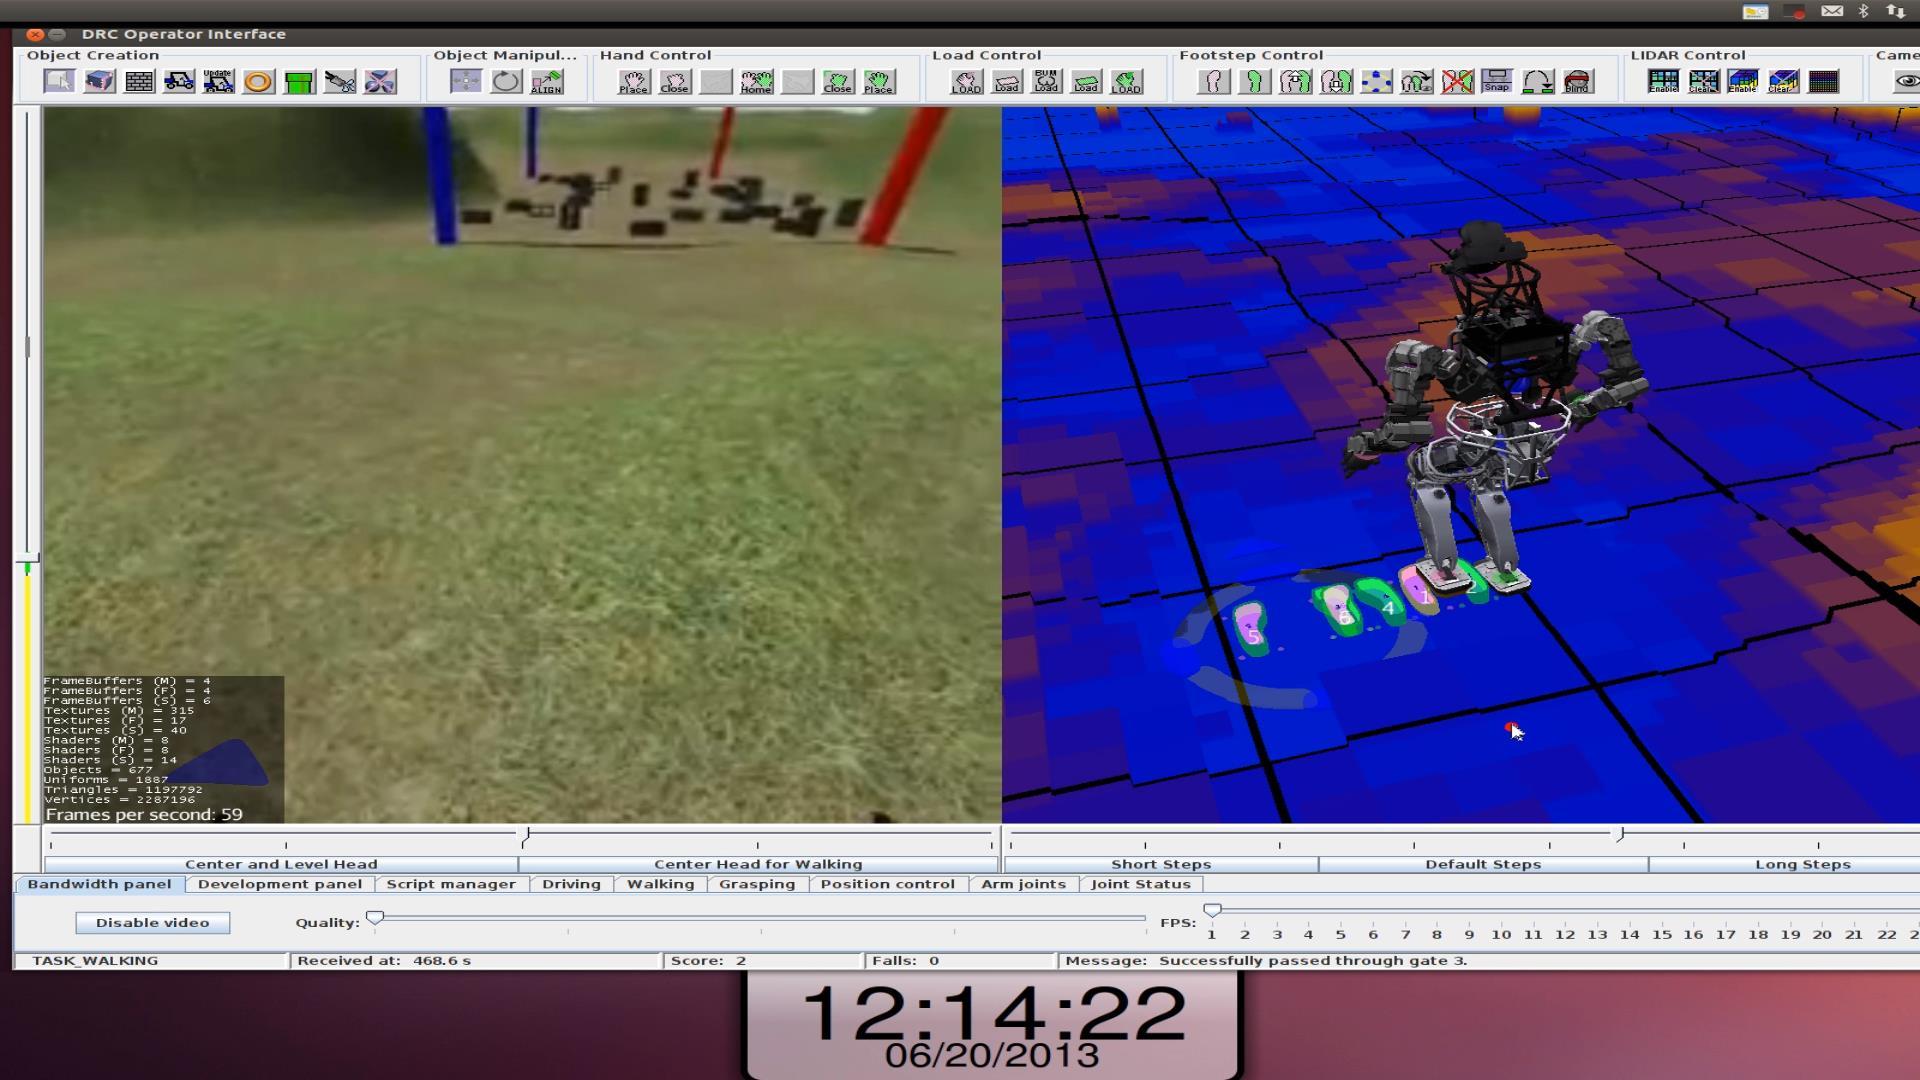 vrc_final_run11_walking (Subclip1).jpg